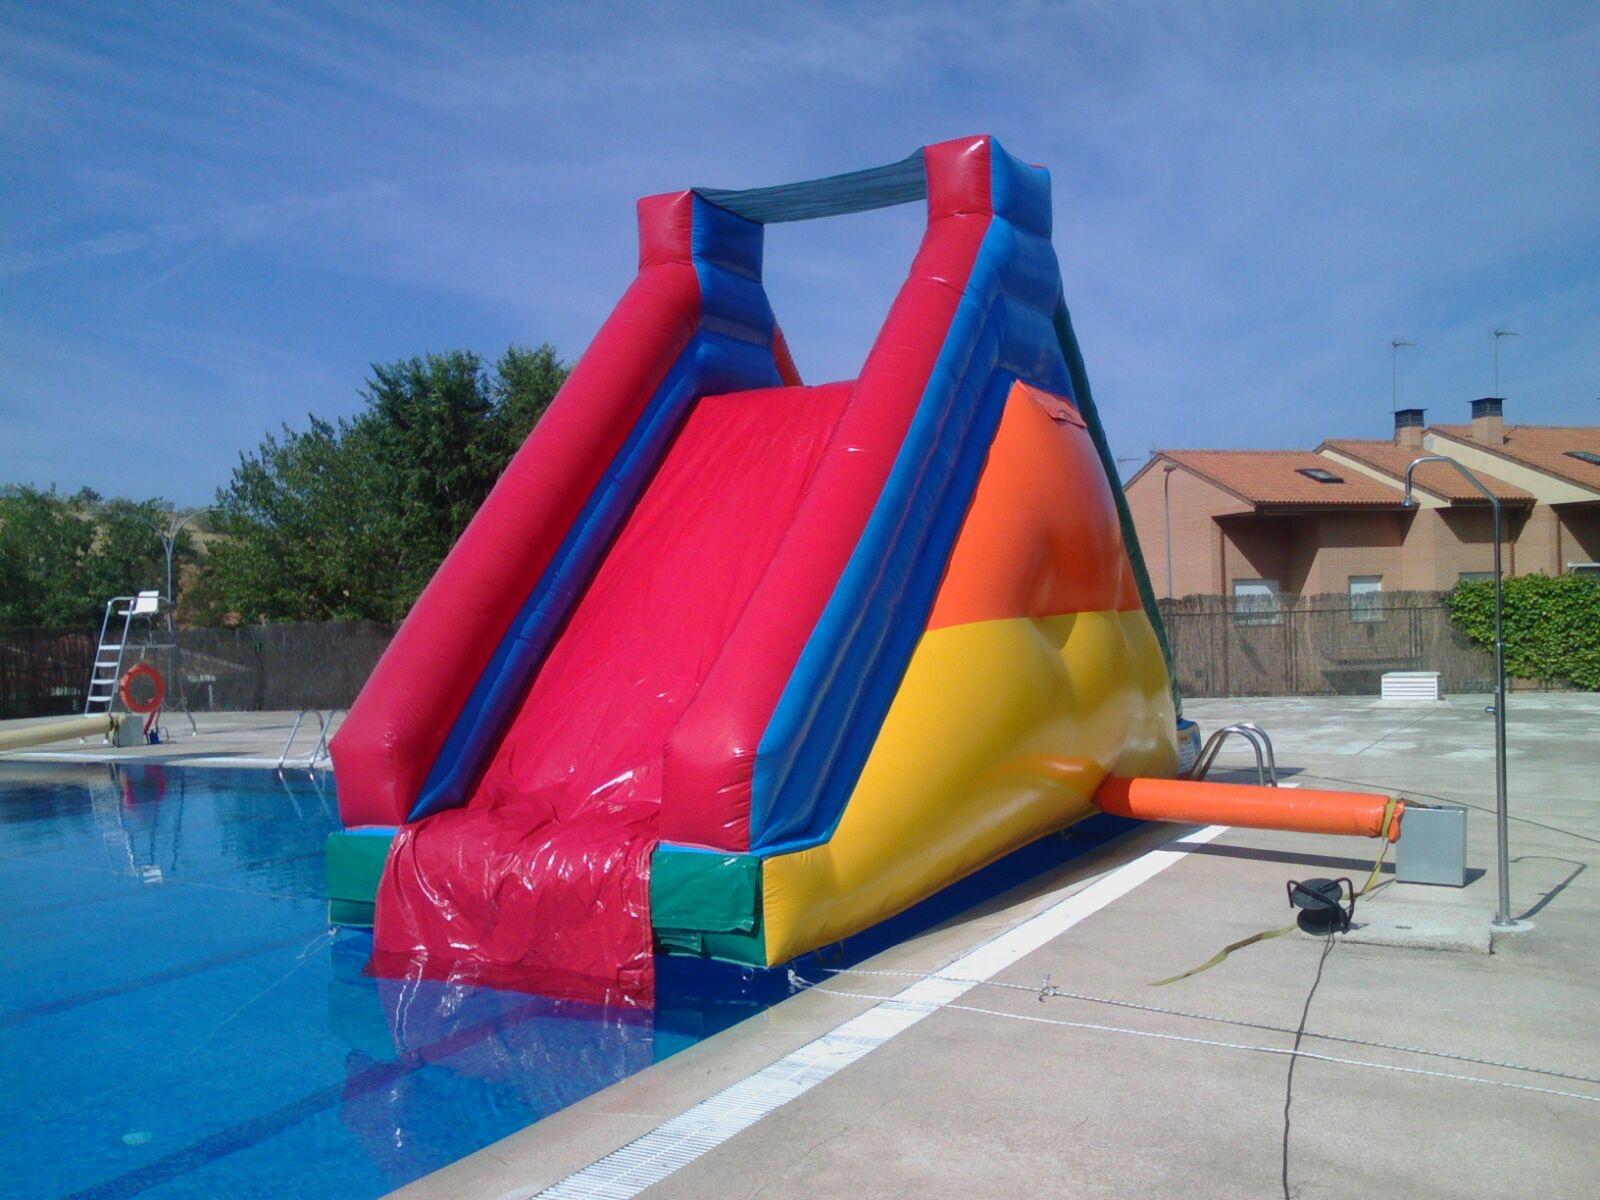 Tobogan piscina tus hinchables alquiler de hinchables en madrid - Tobogan hinchable para piscina ...